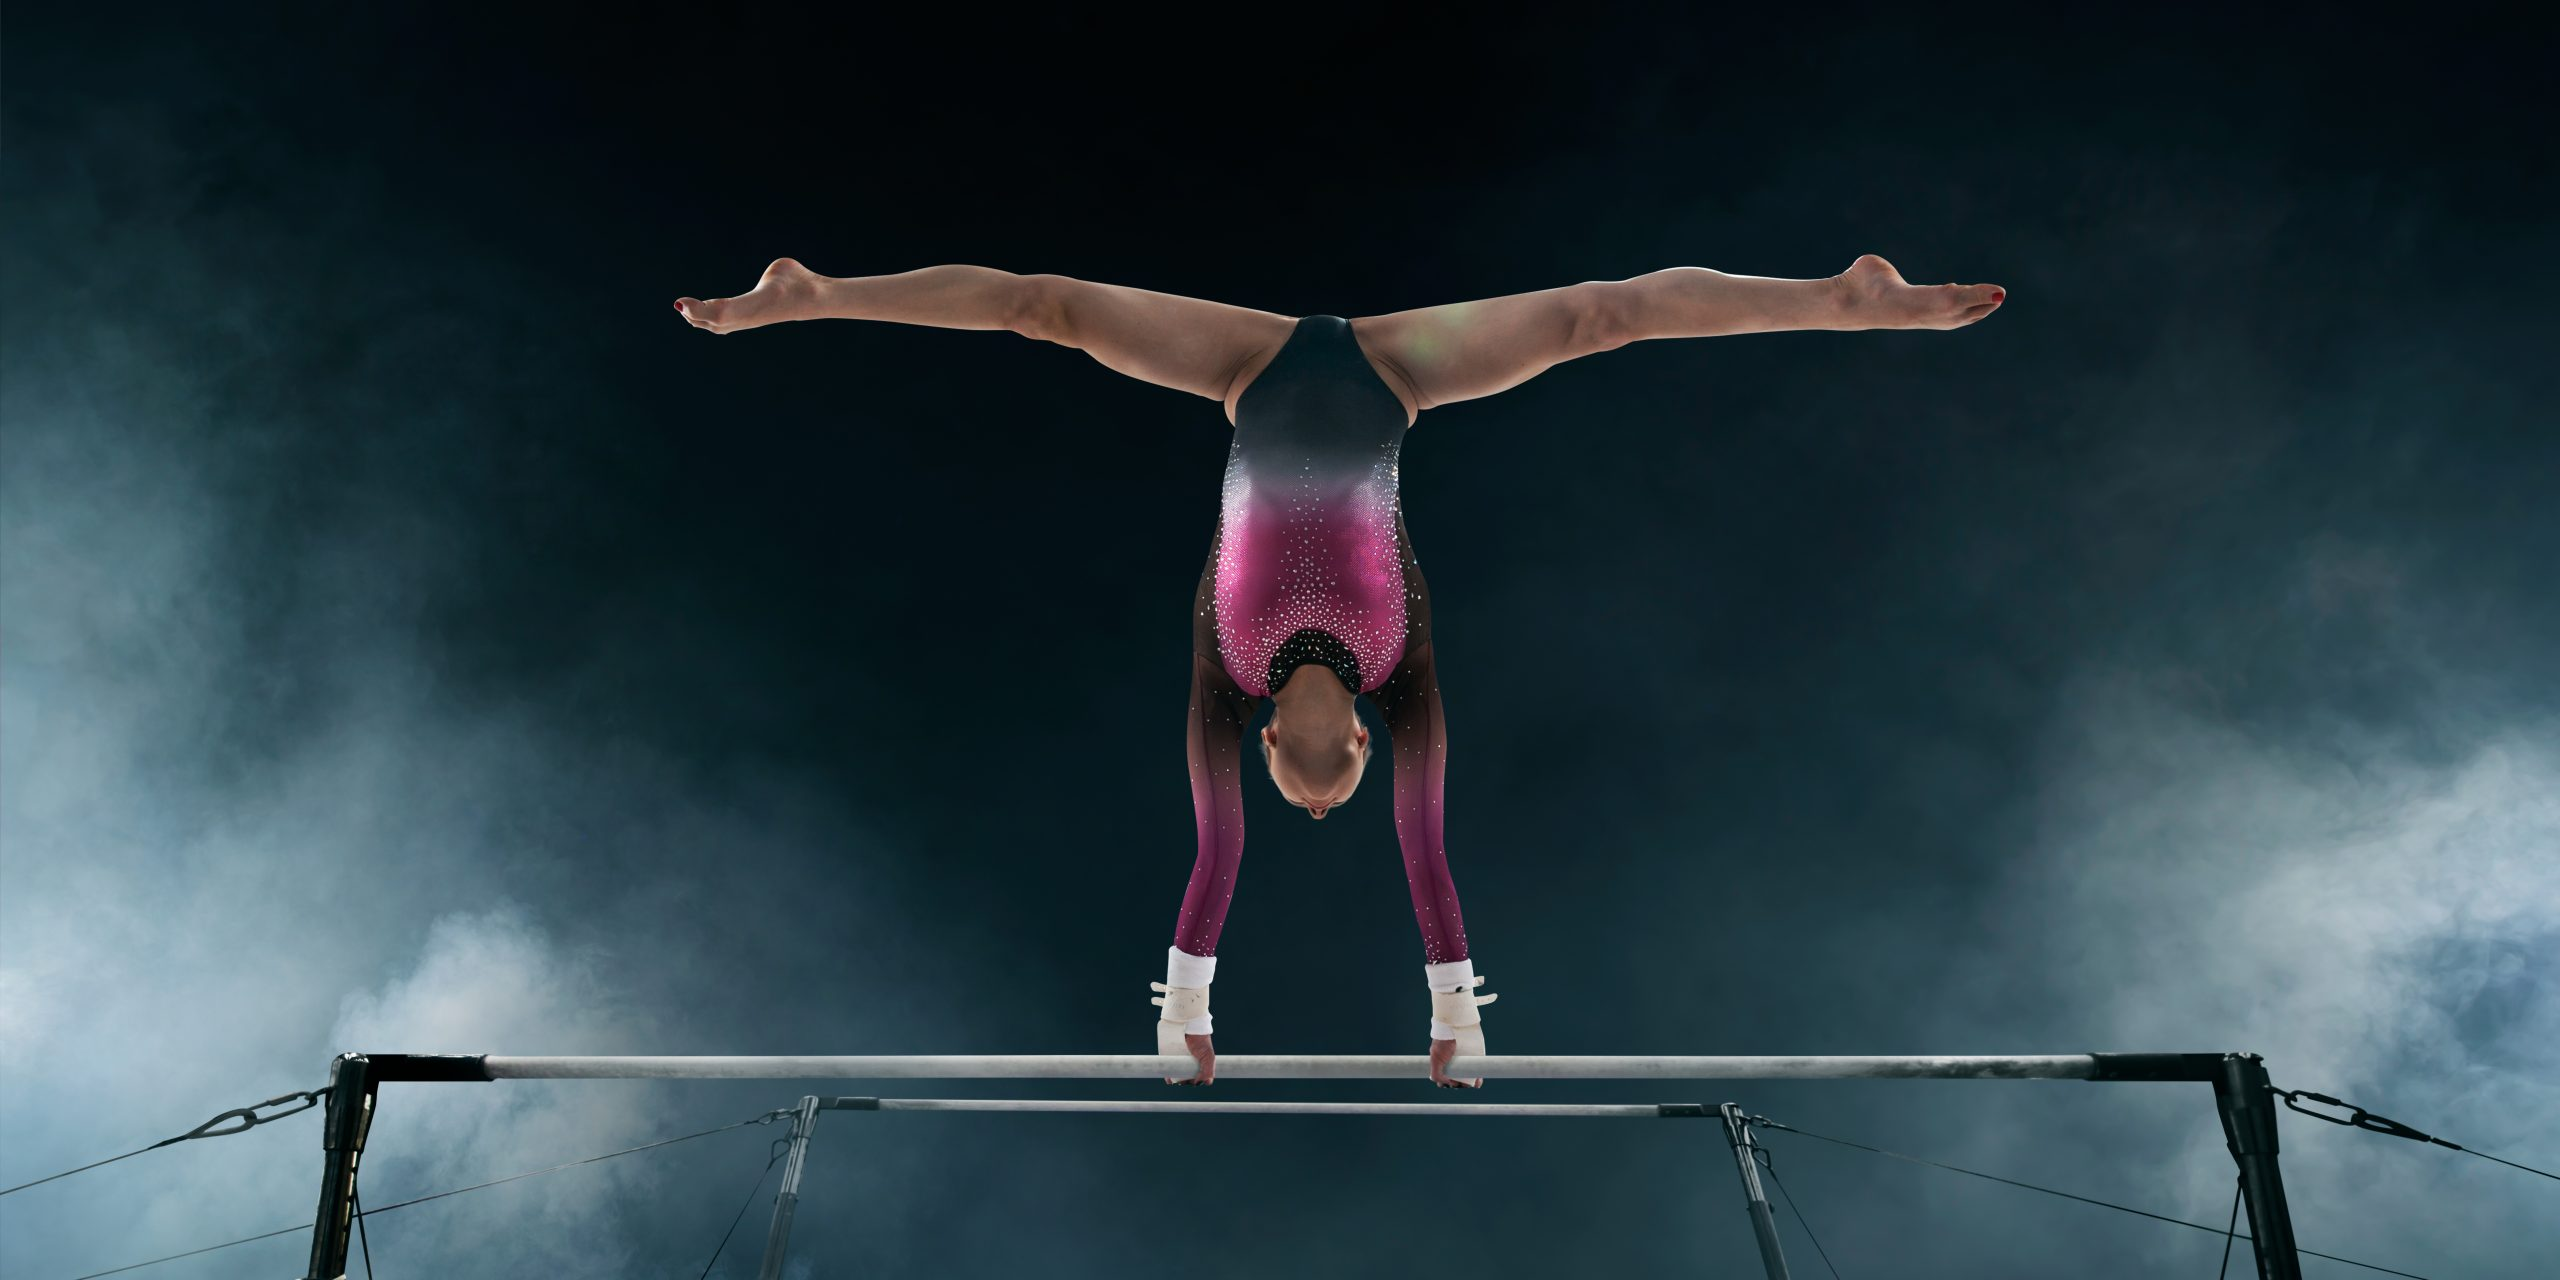 gymnast on gymnastics bar for home